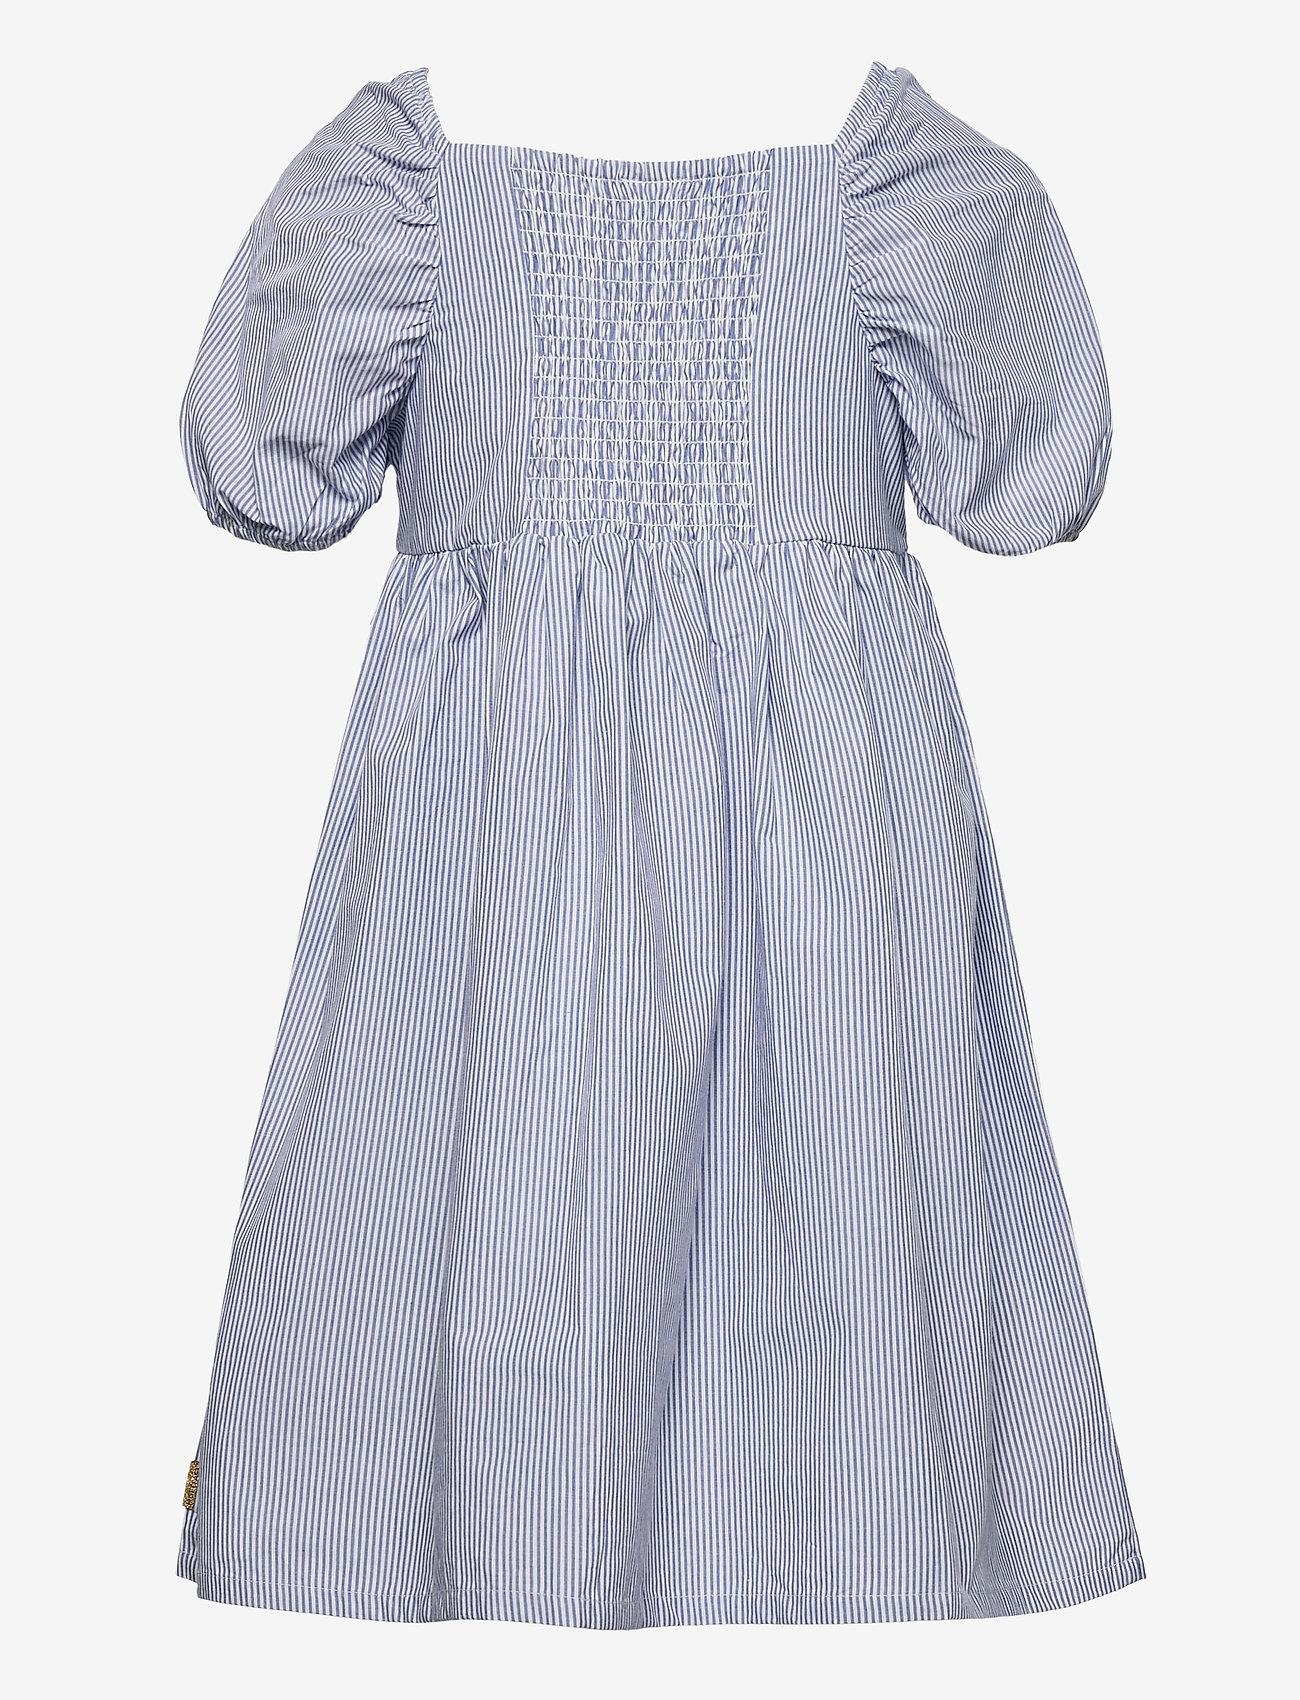 Hust & Claire - Kathy - Dress - kleider - dream blue - 1